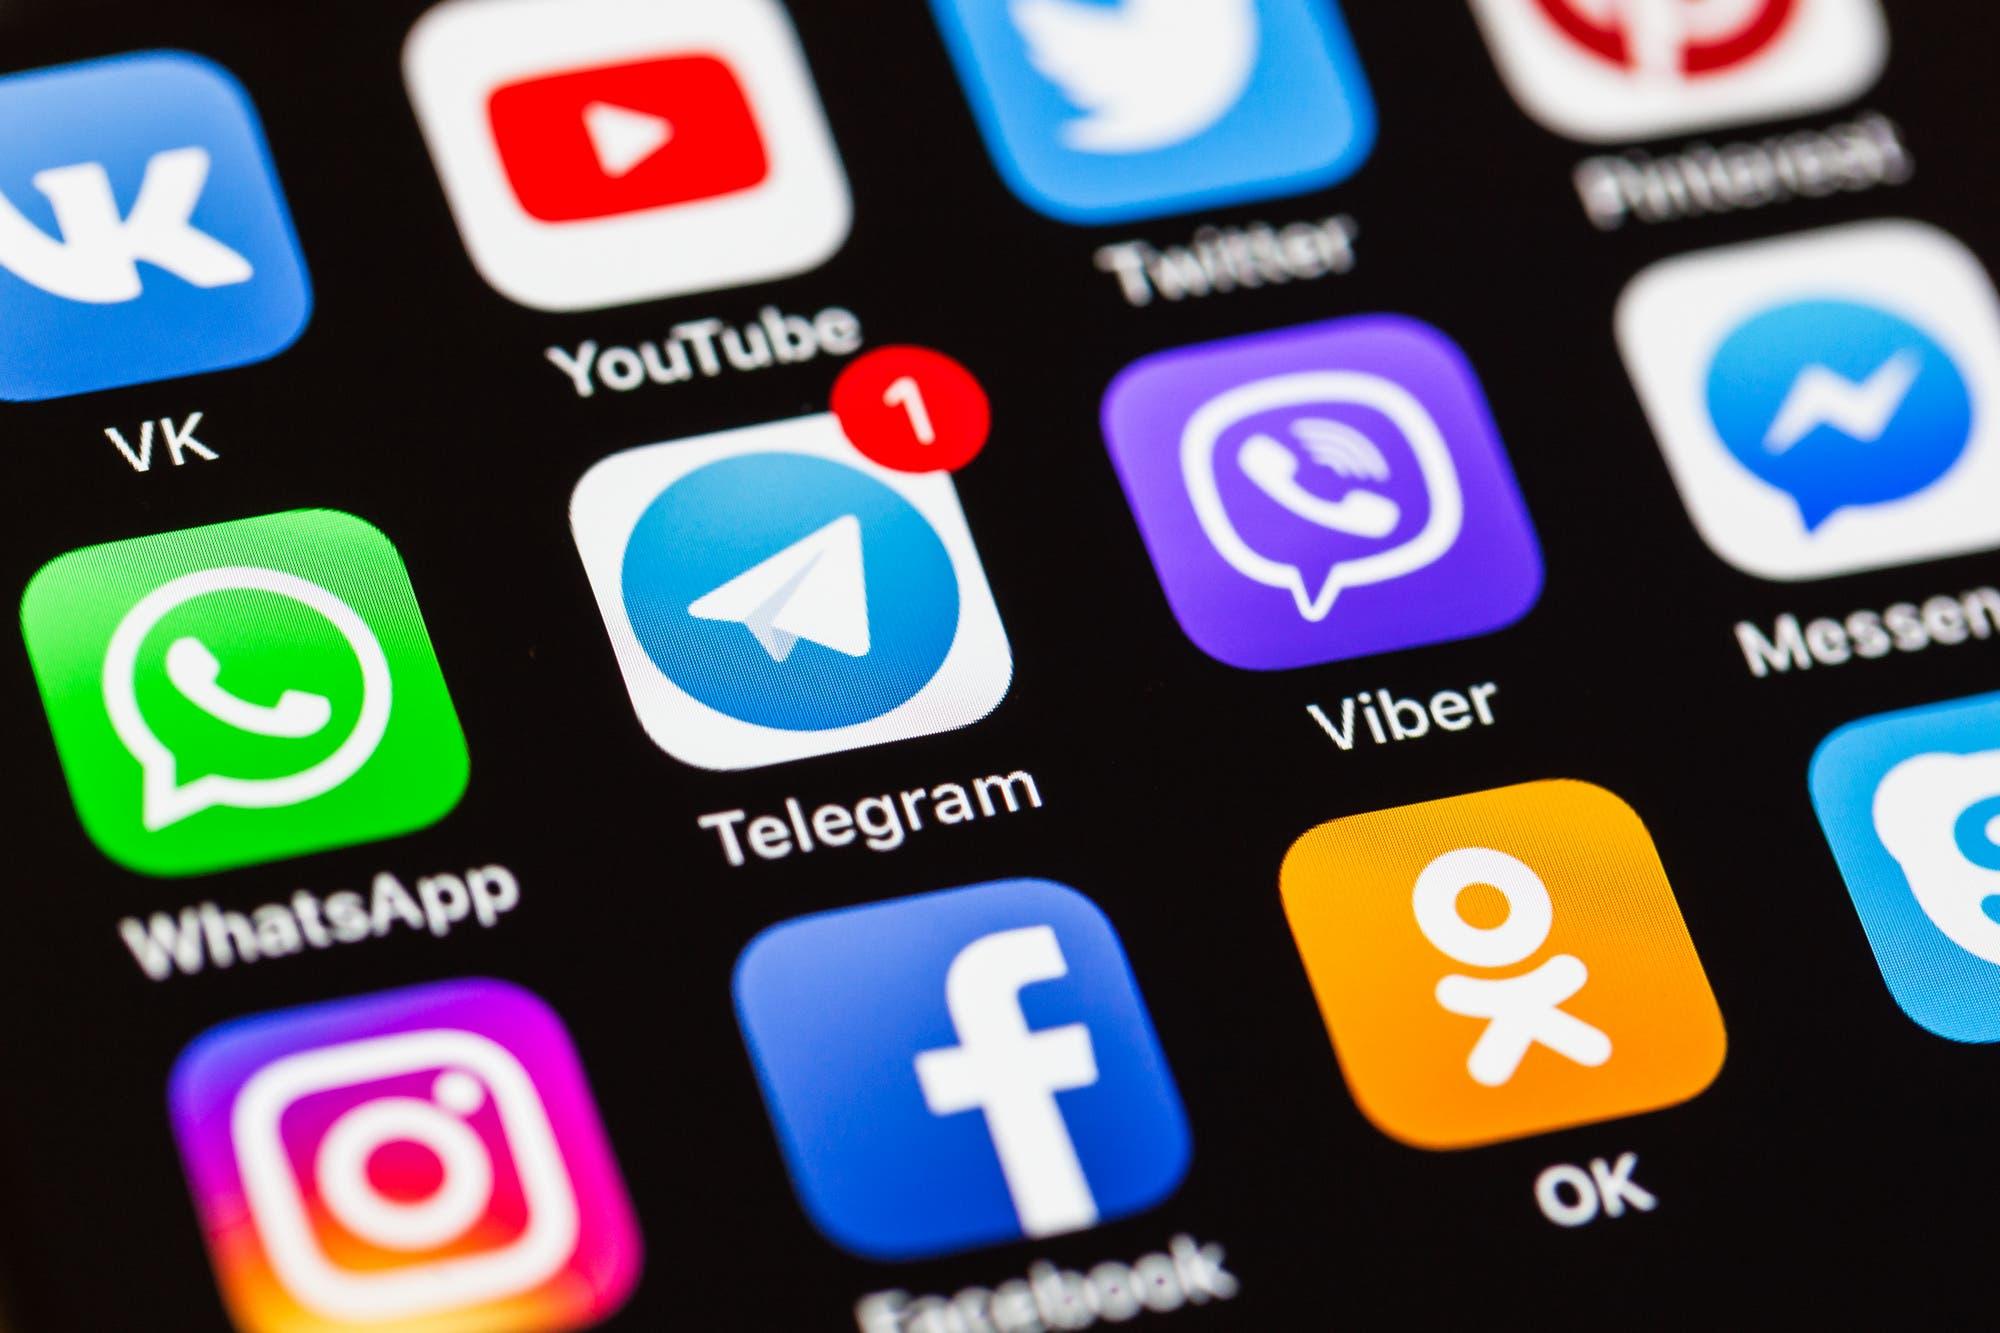 Caída de WhatsApp: de Telegram a Google Duo, cinco chats alternativos para tener a mano